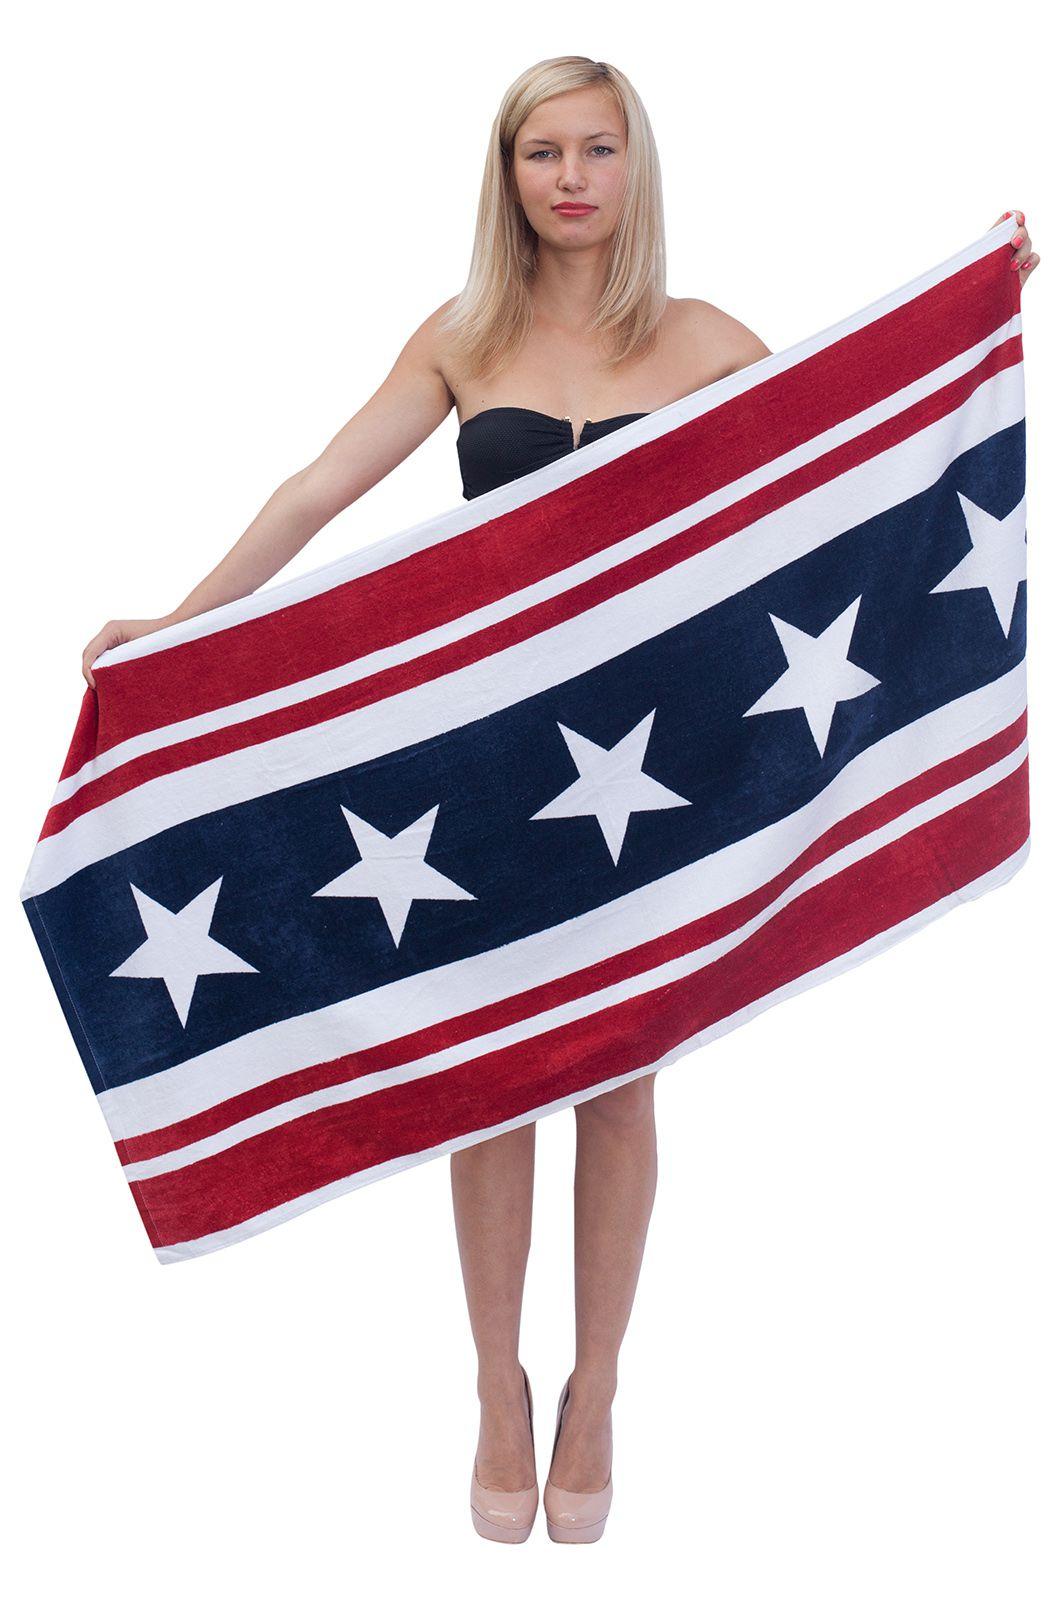 Махровое полотенце 70x140 - купить недорого